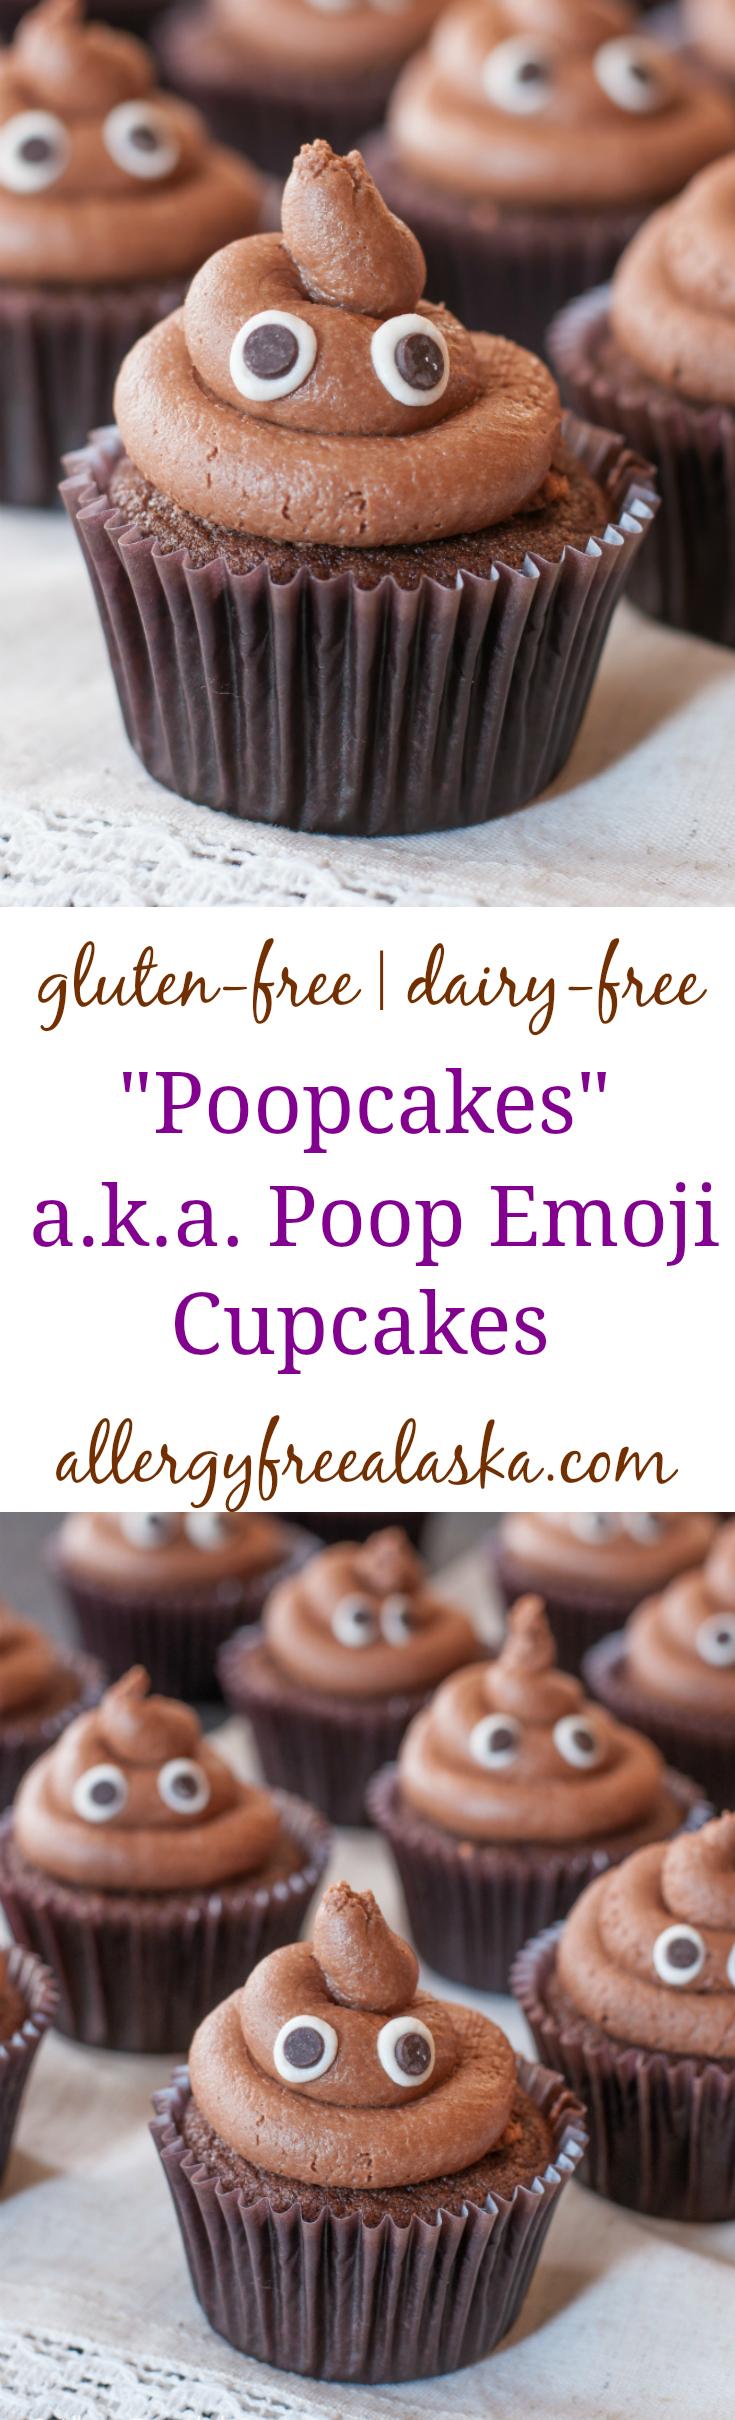 gluten-free-dairy-free-poop-emoji-cupcakes-recipe